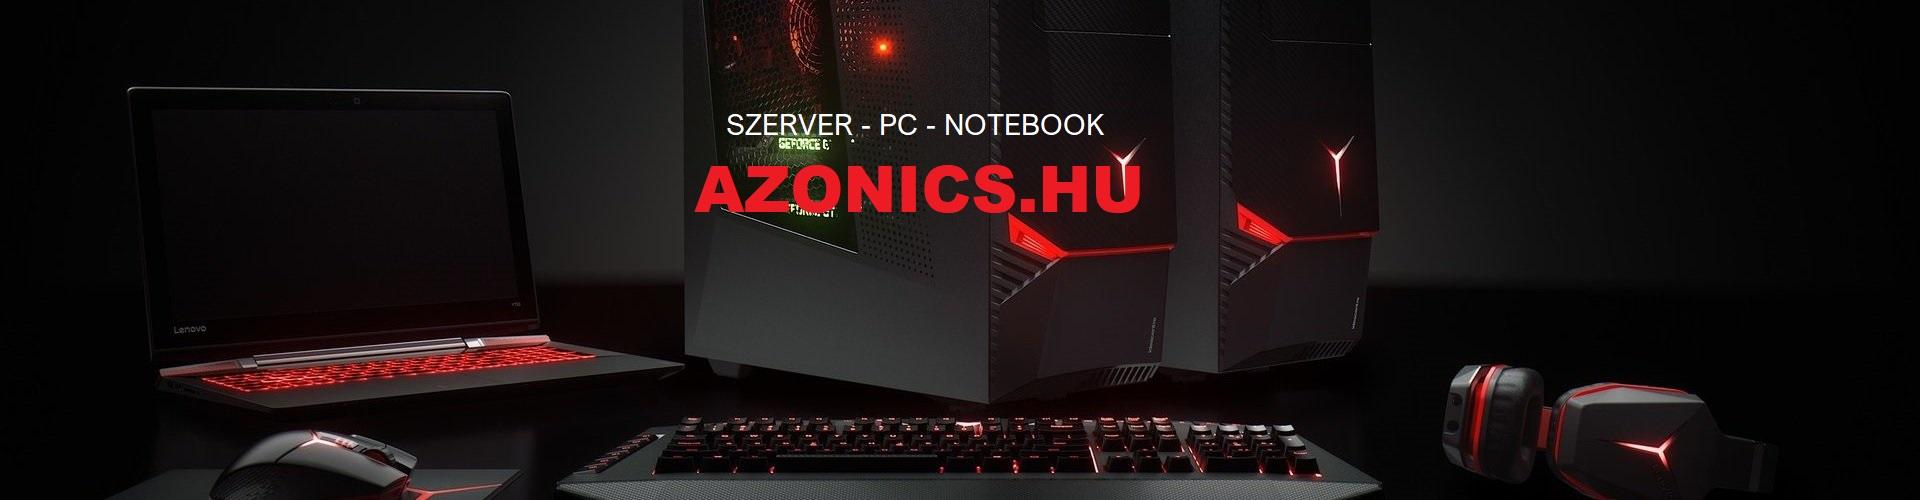 Azonics.hu